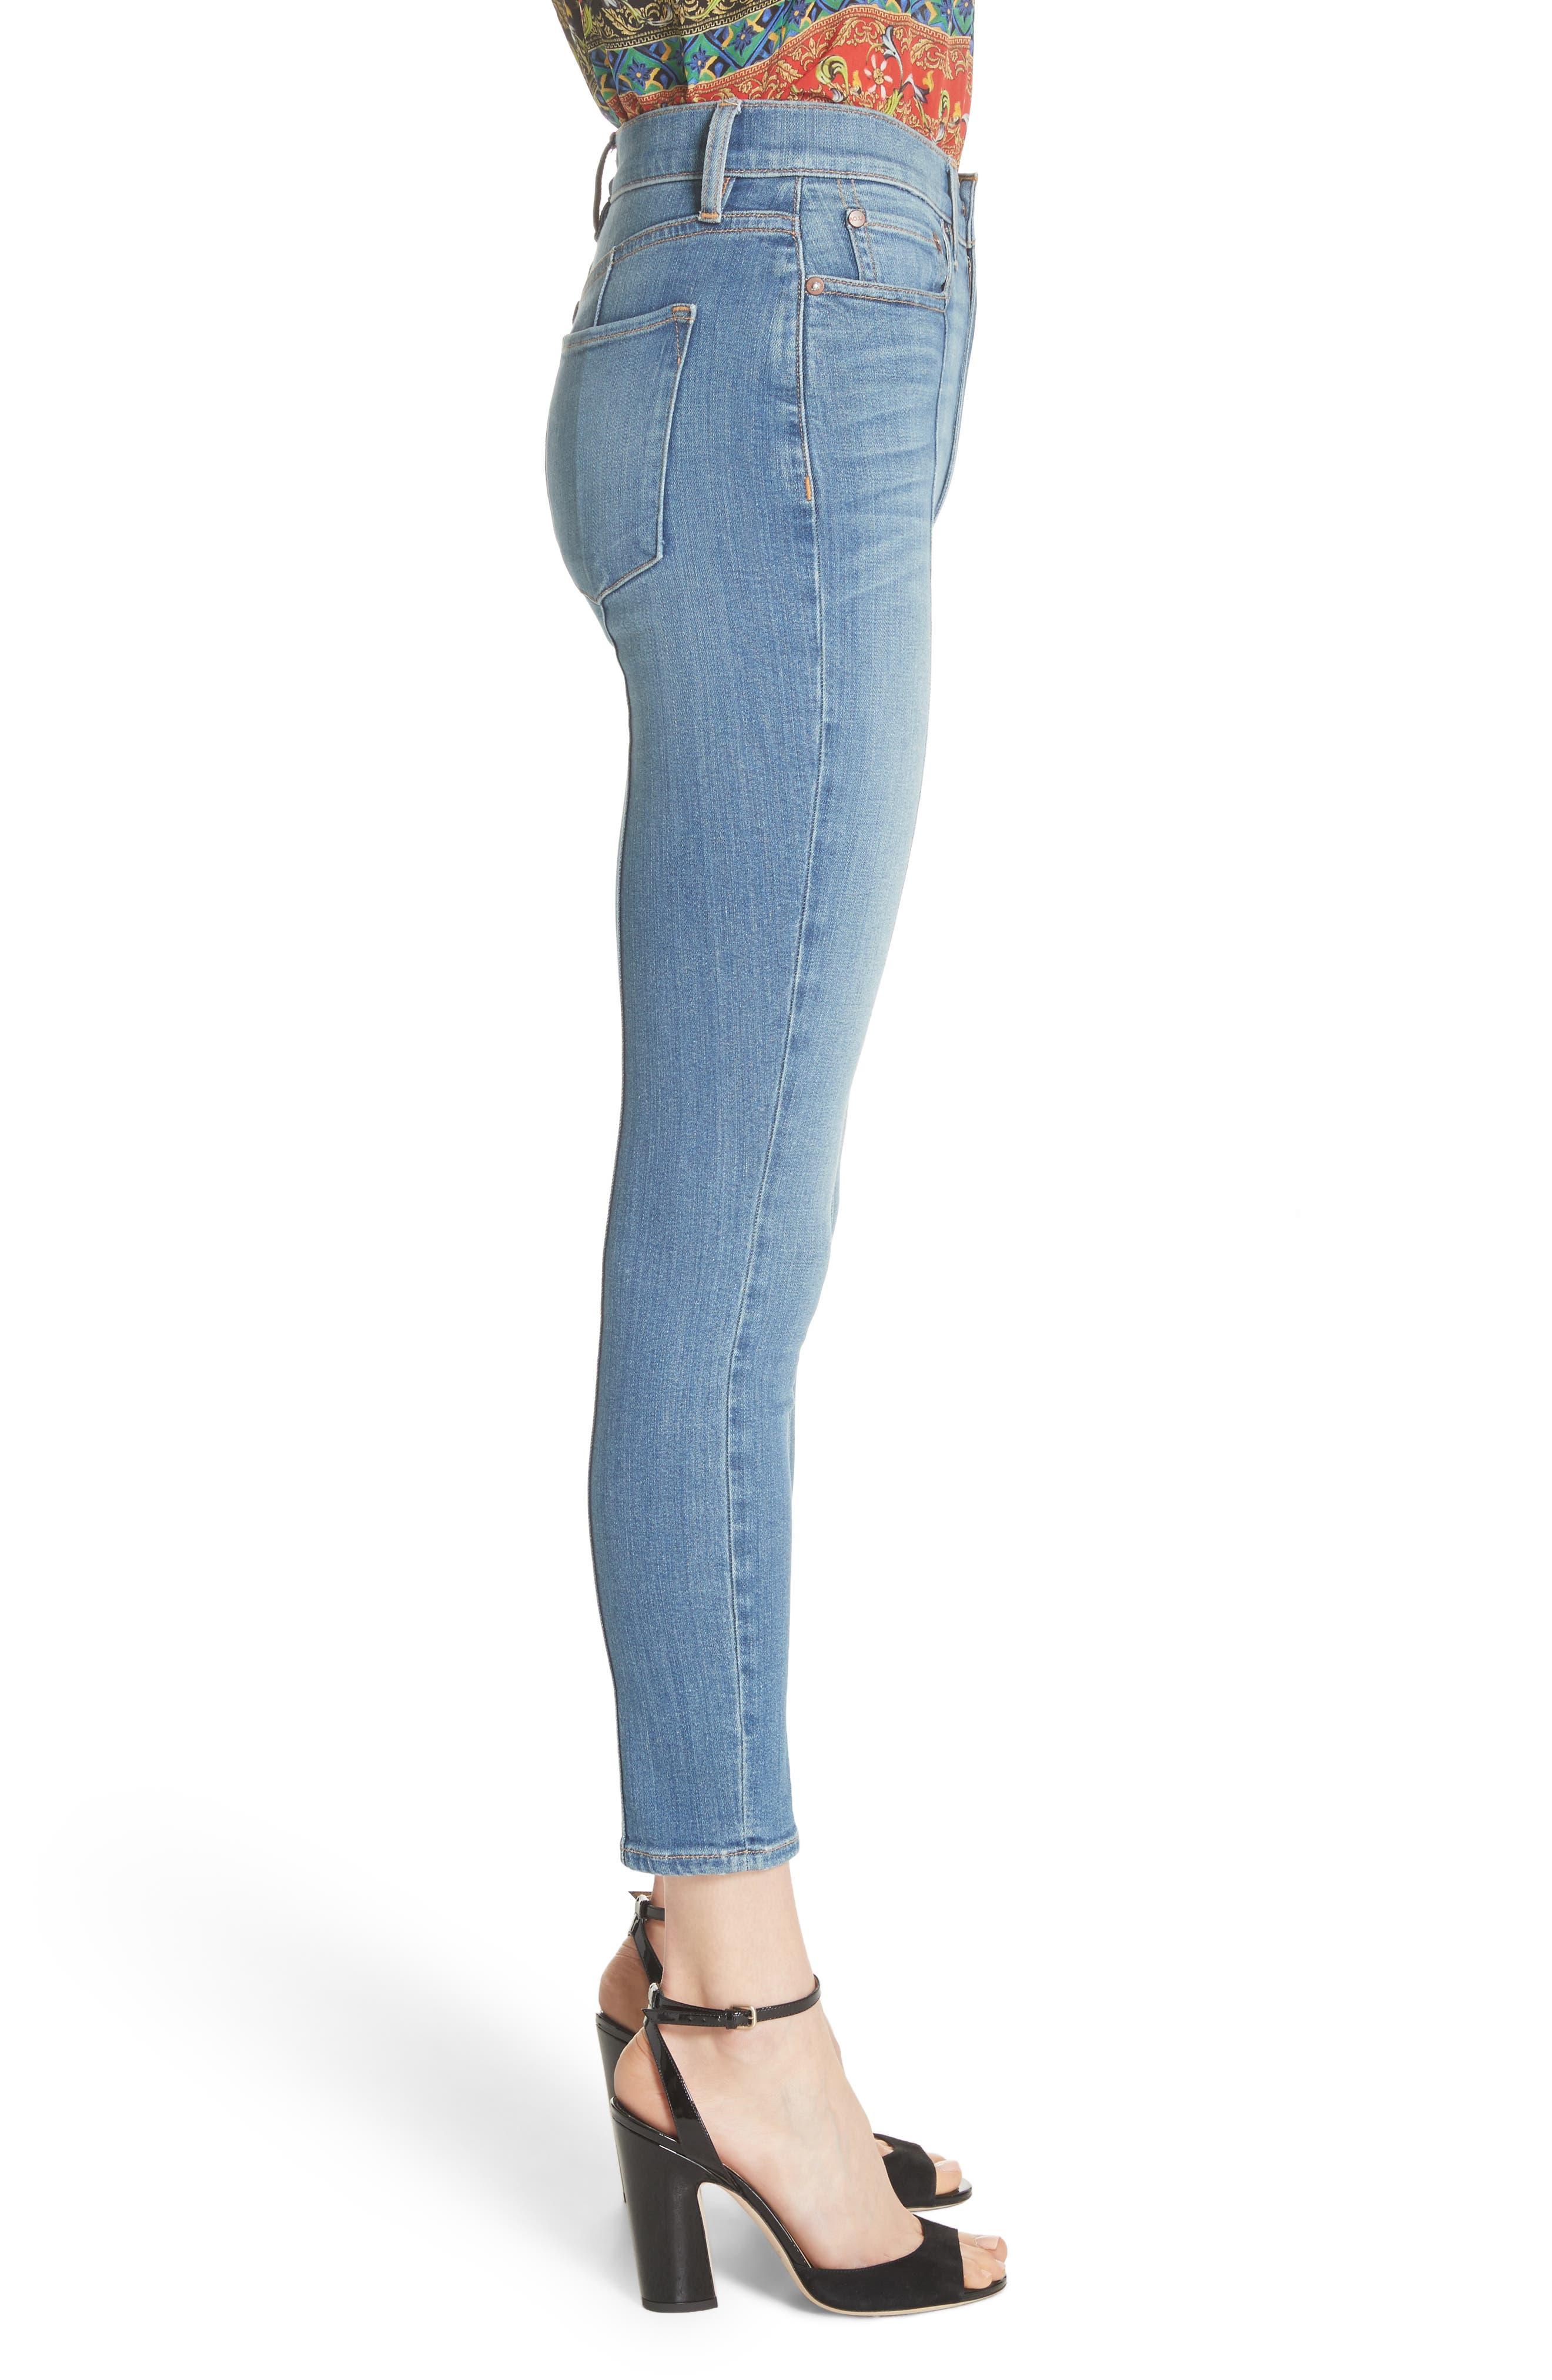 AO.LA Good High Waist Pintuck Skinny Jeans,                             Alternate thumbnail 3, color,                             Roadhouse Blues